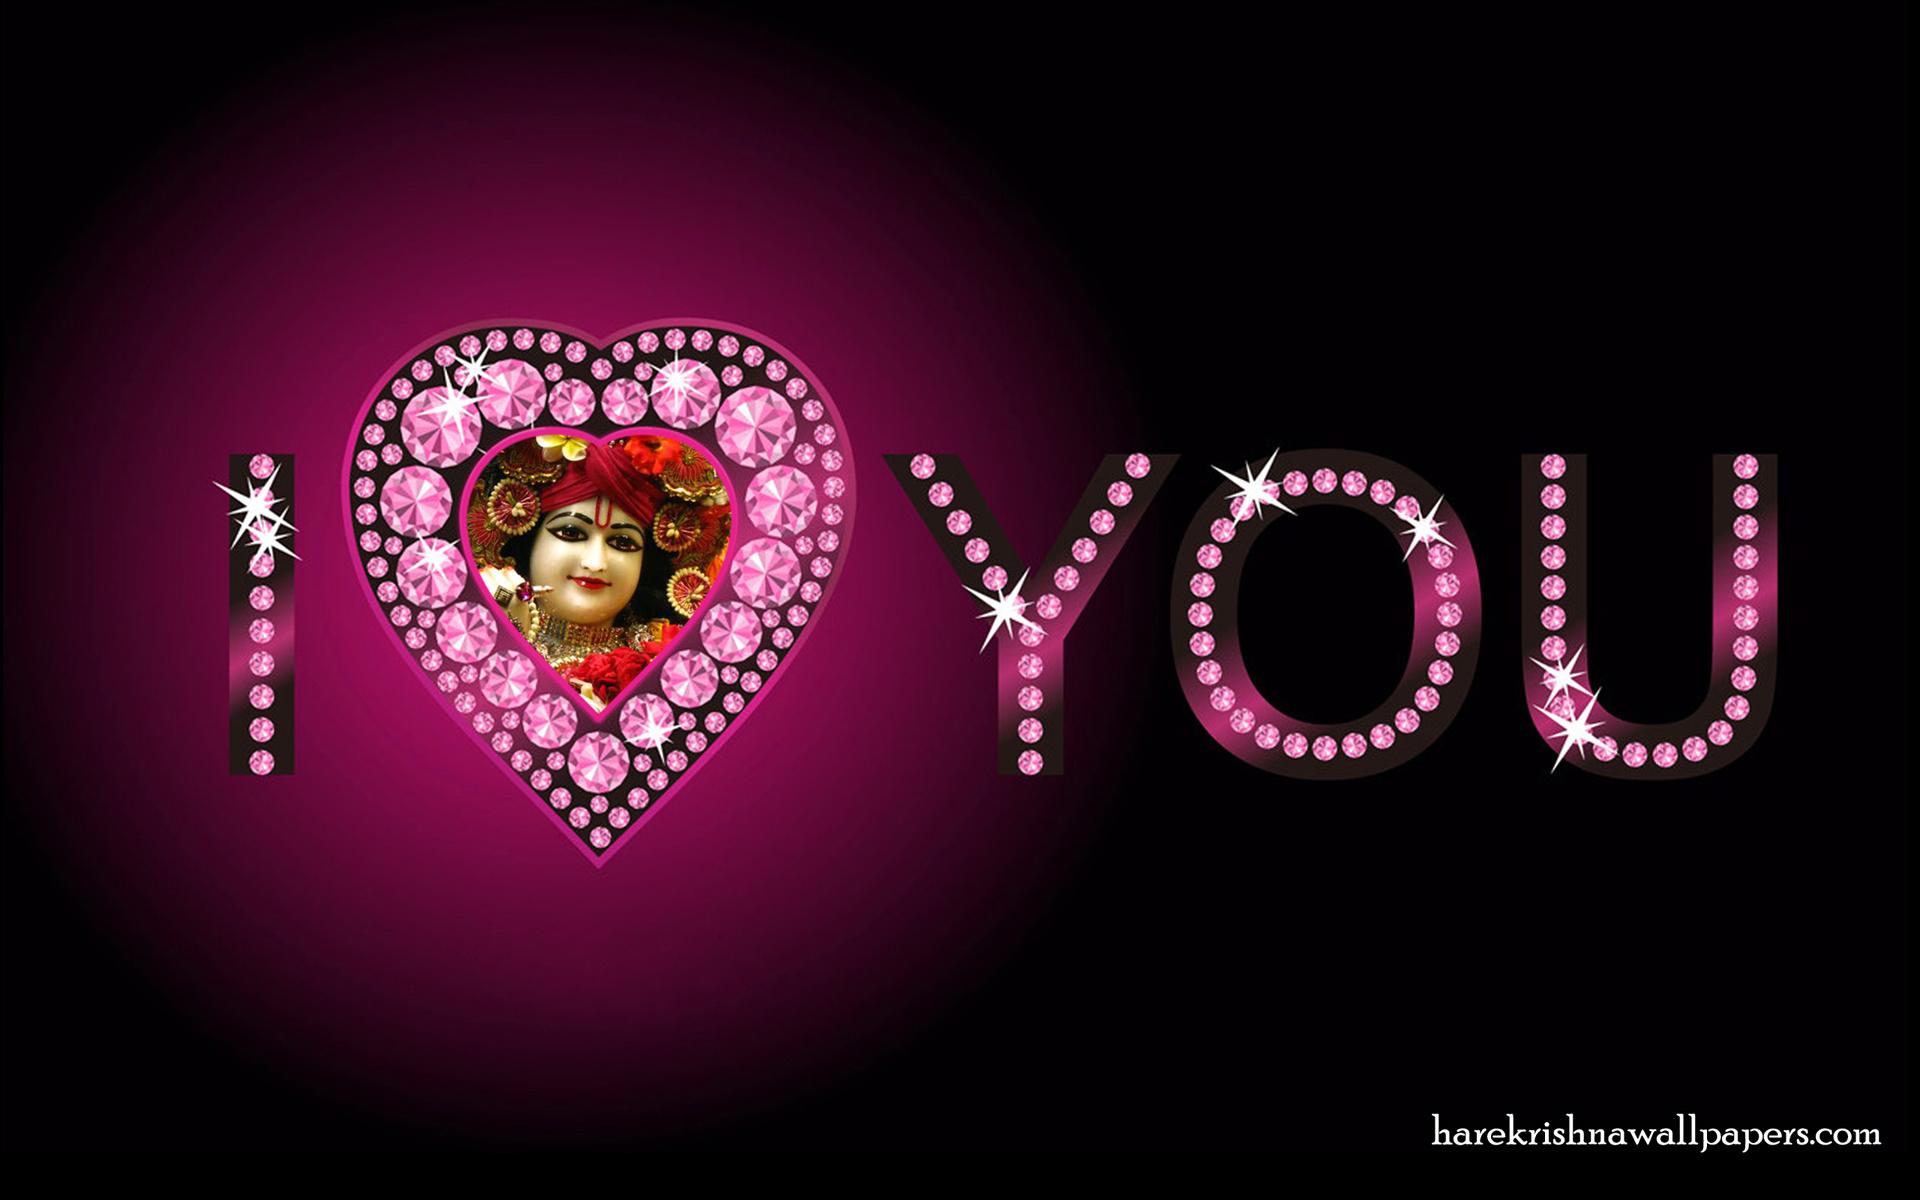 I Love You Rasabihari Wallpaper (004) Size 1920x1200 Download